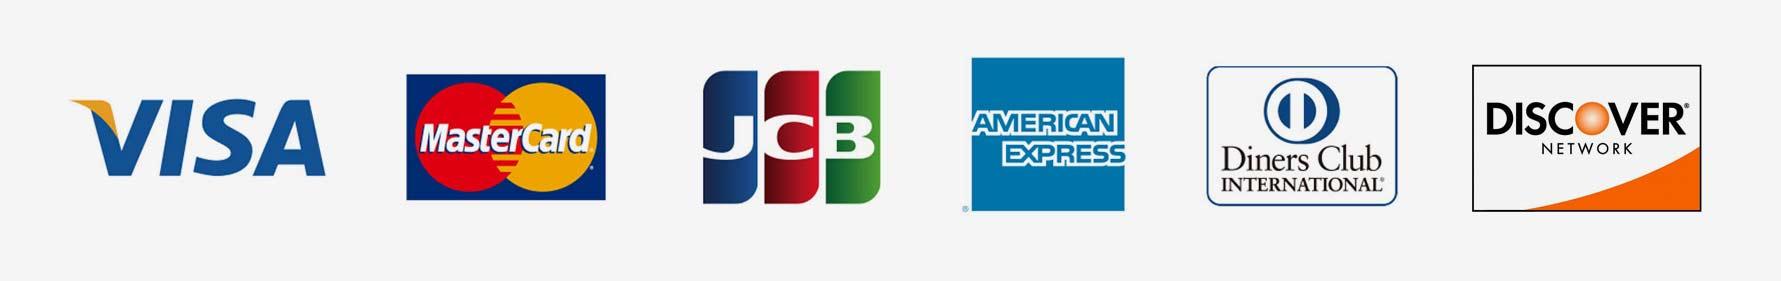 VISA/MasterCard/JCB/Amerecan Express/Diners Club/Discover